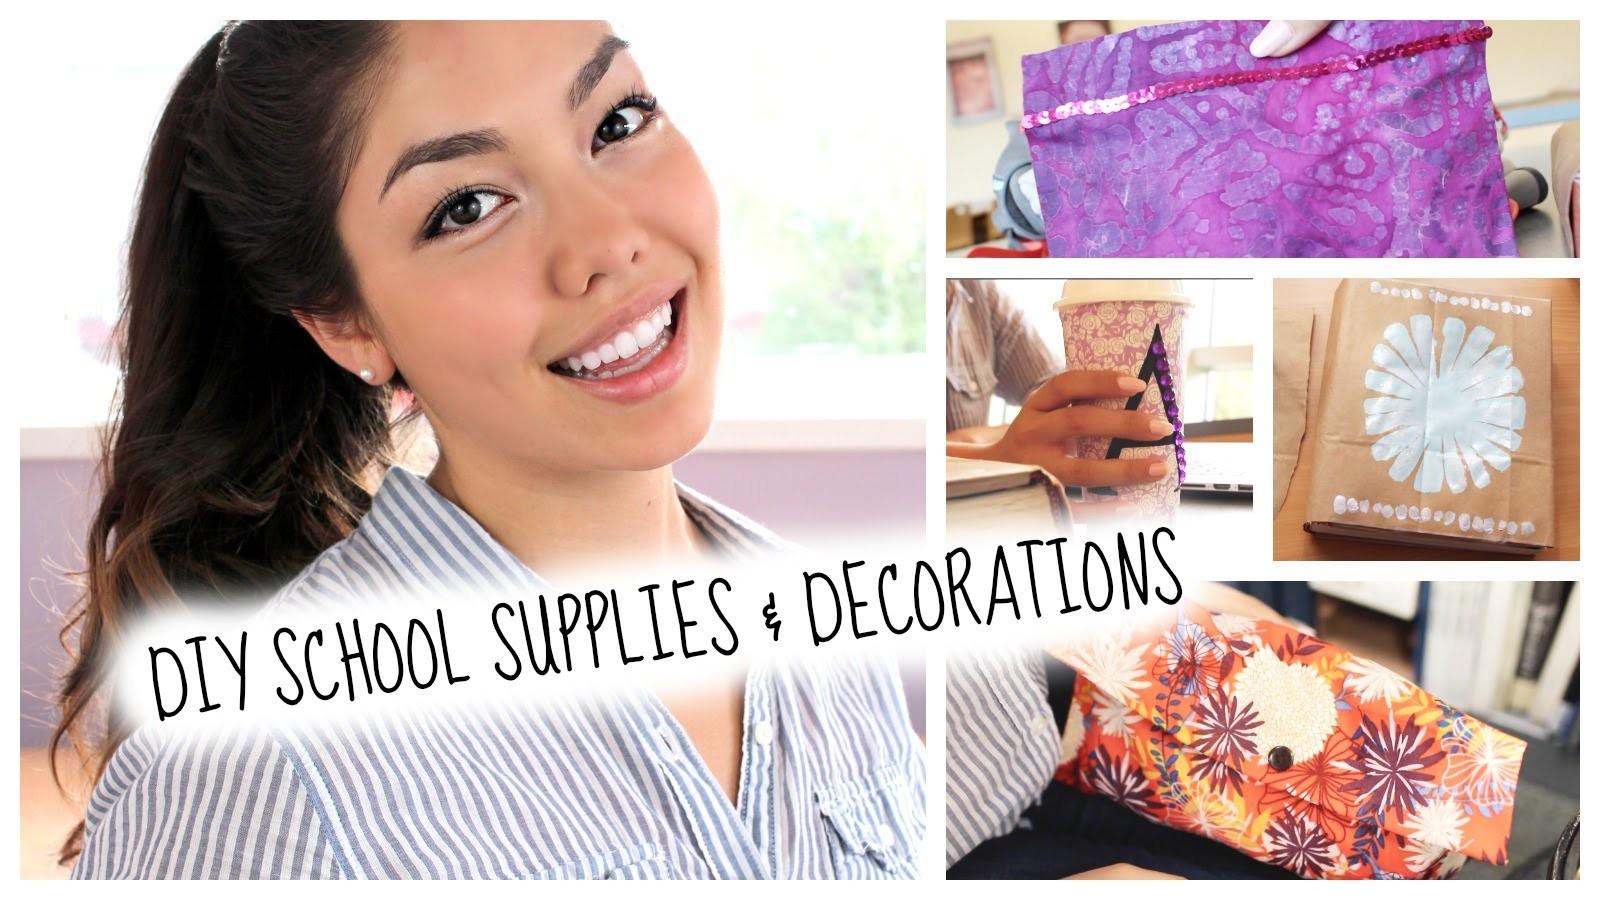 Back to School: DIY School Supplies + Decorations